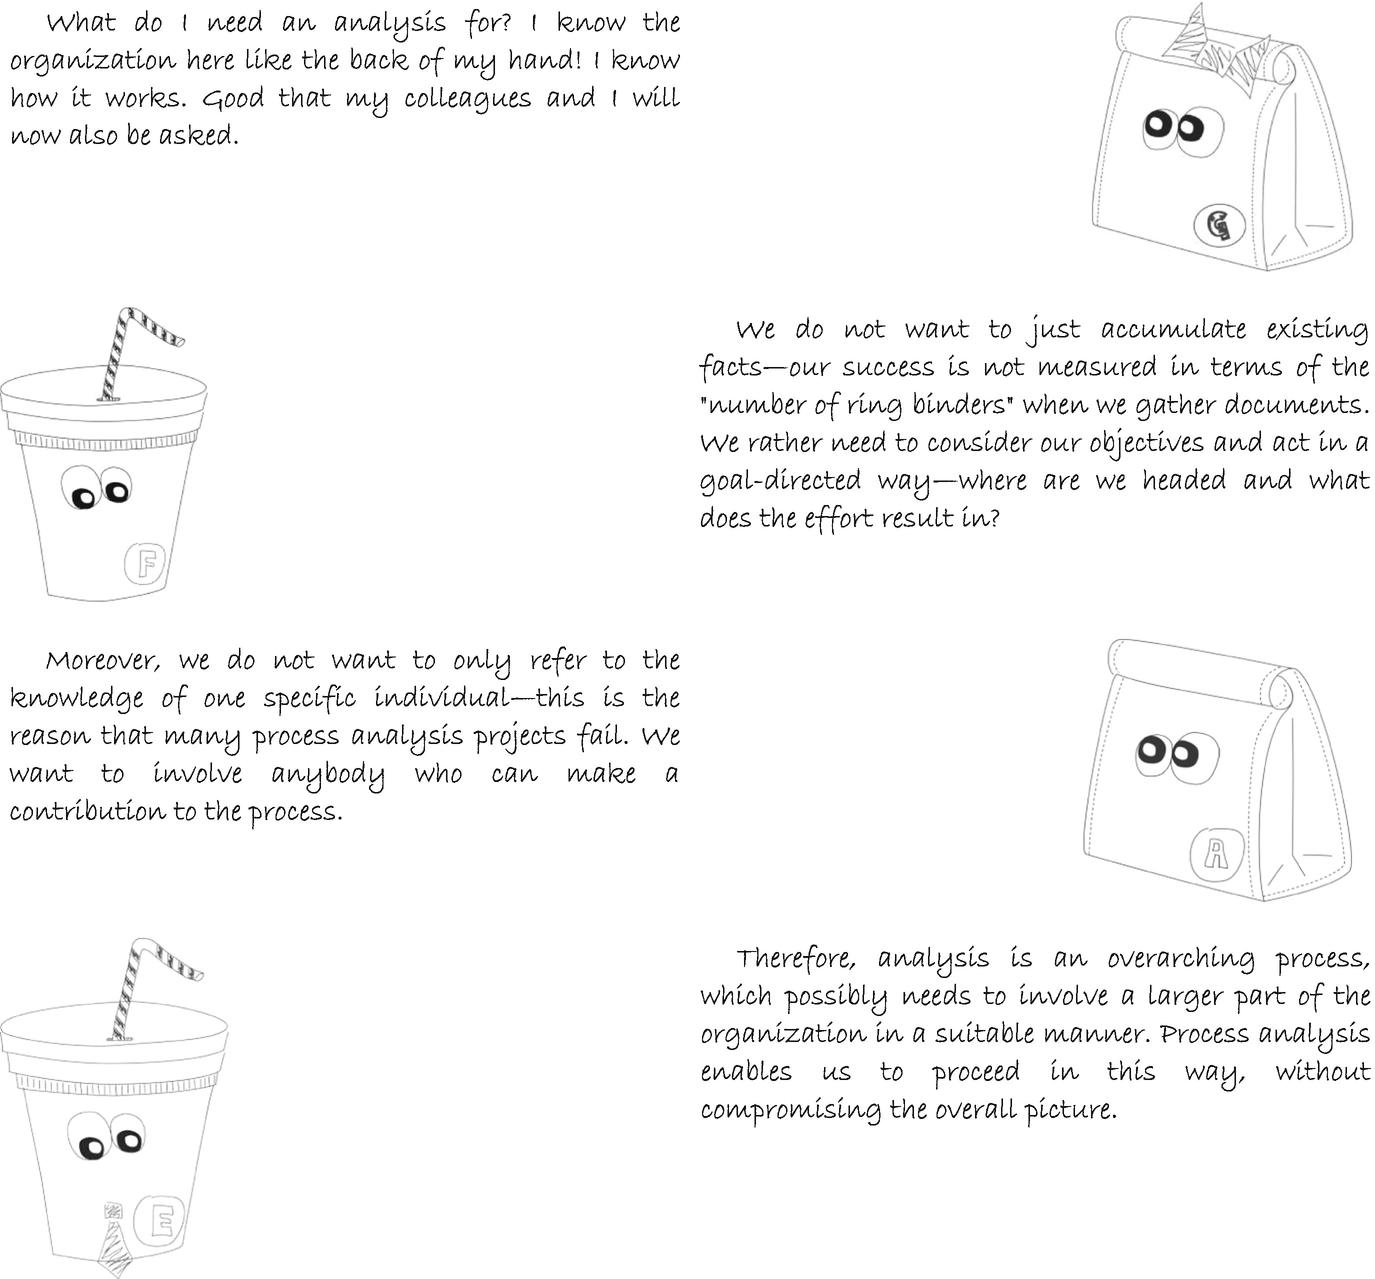 Subject-Oriented Process Analysis | SpringerLink